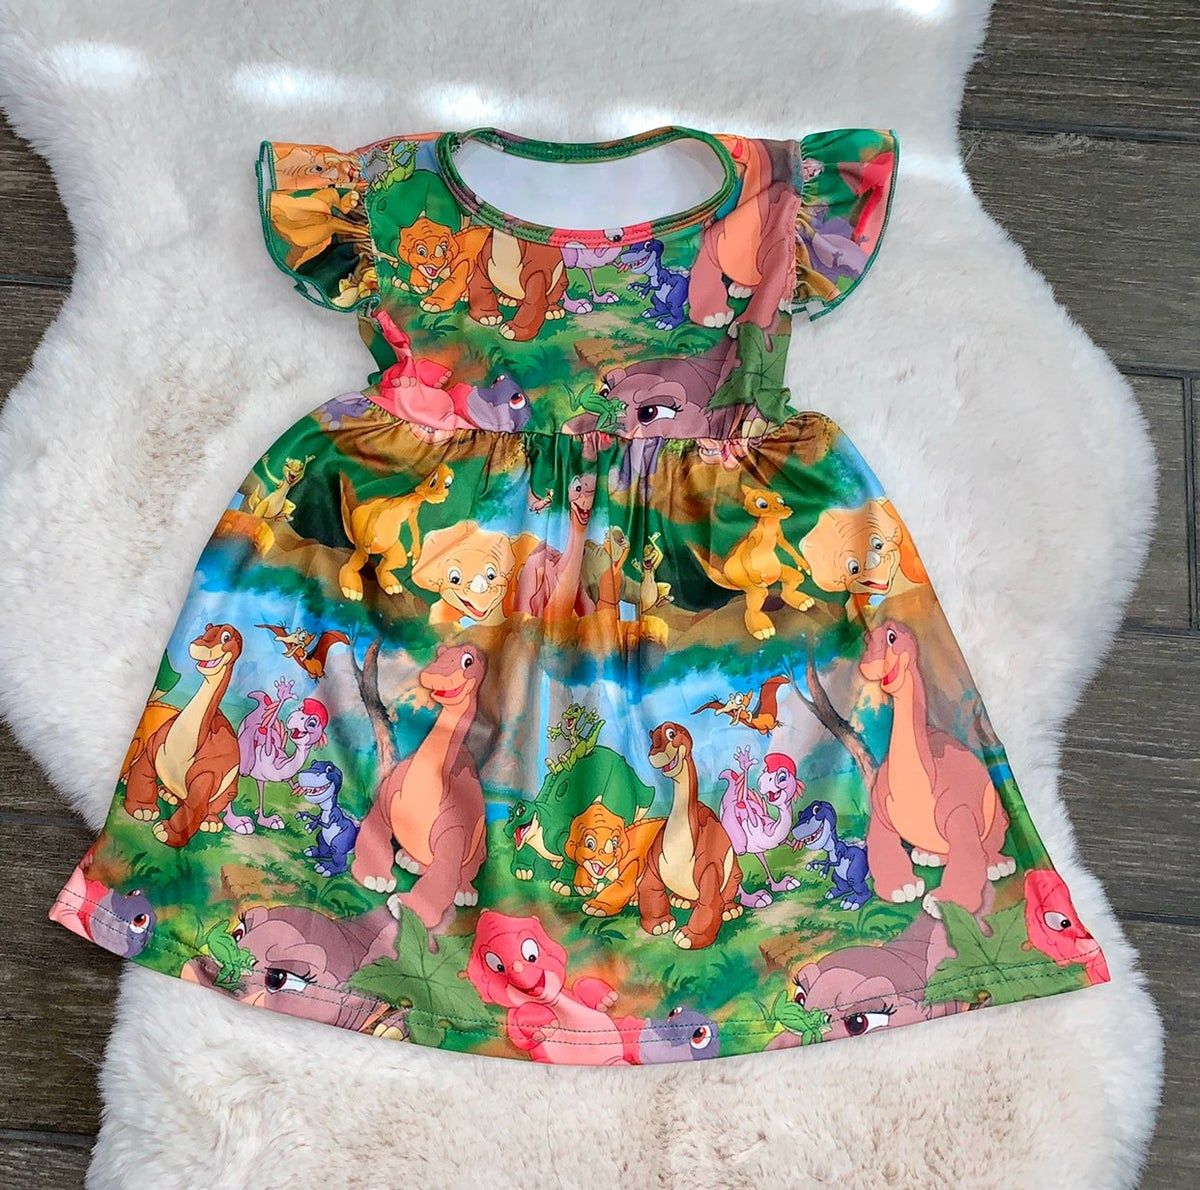 Pin By Maria Rodriguez On Adorable Dinosaur Dress 3t Dress Dresses 5t [ 1190 x 1200 Pixel ]